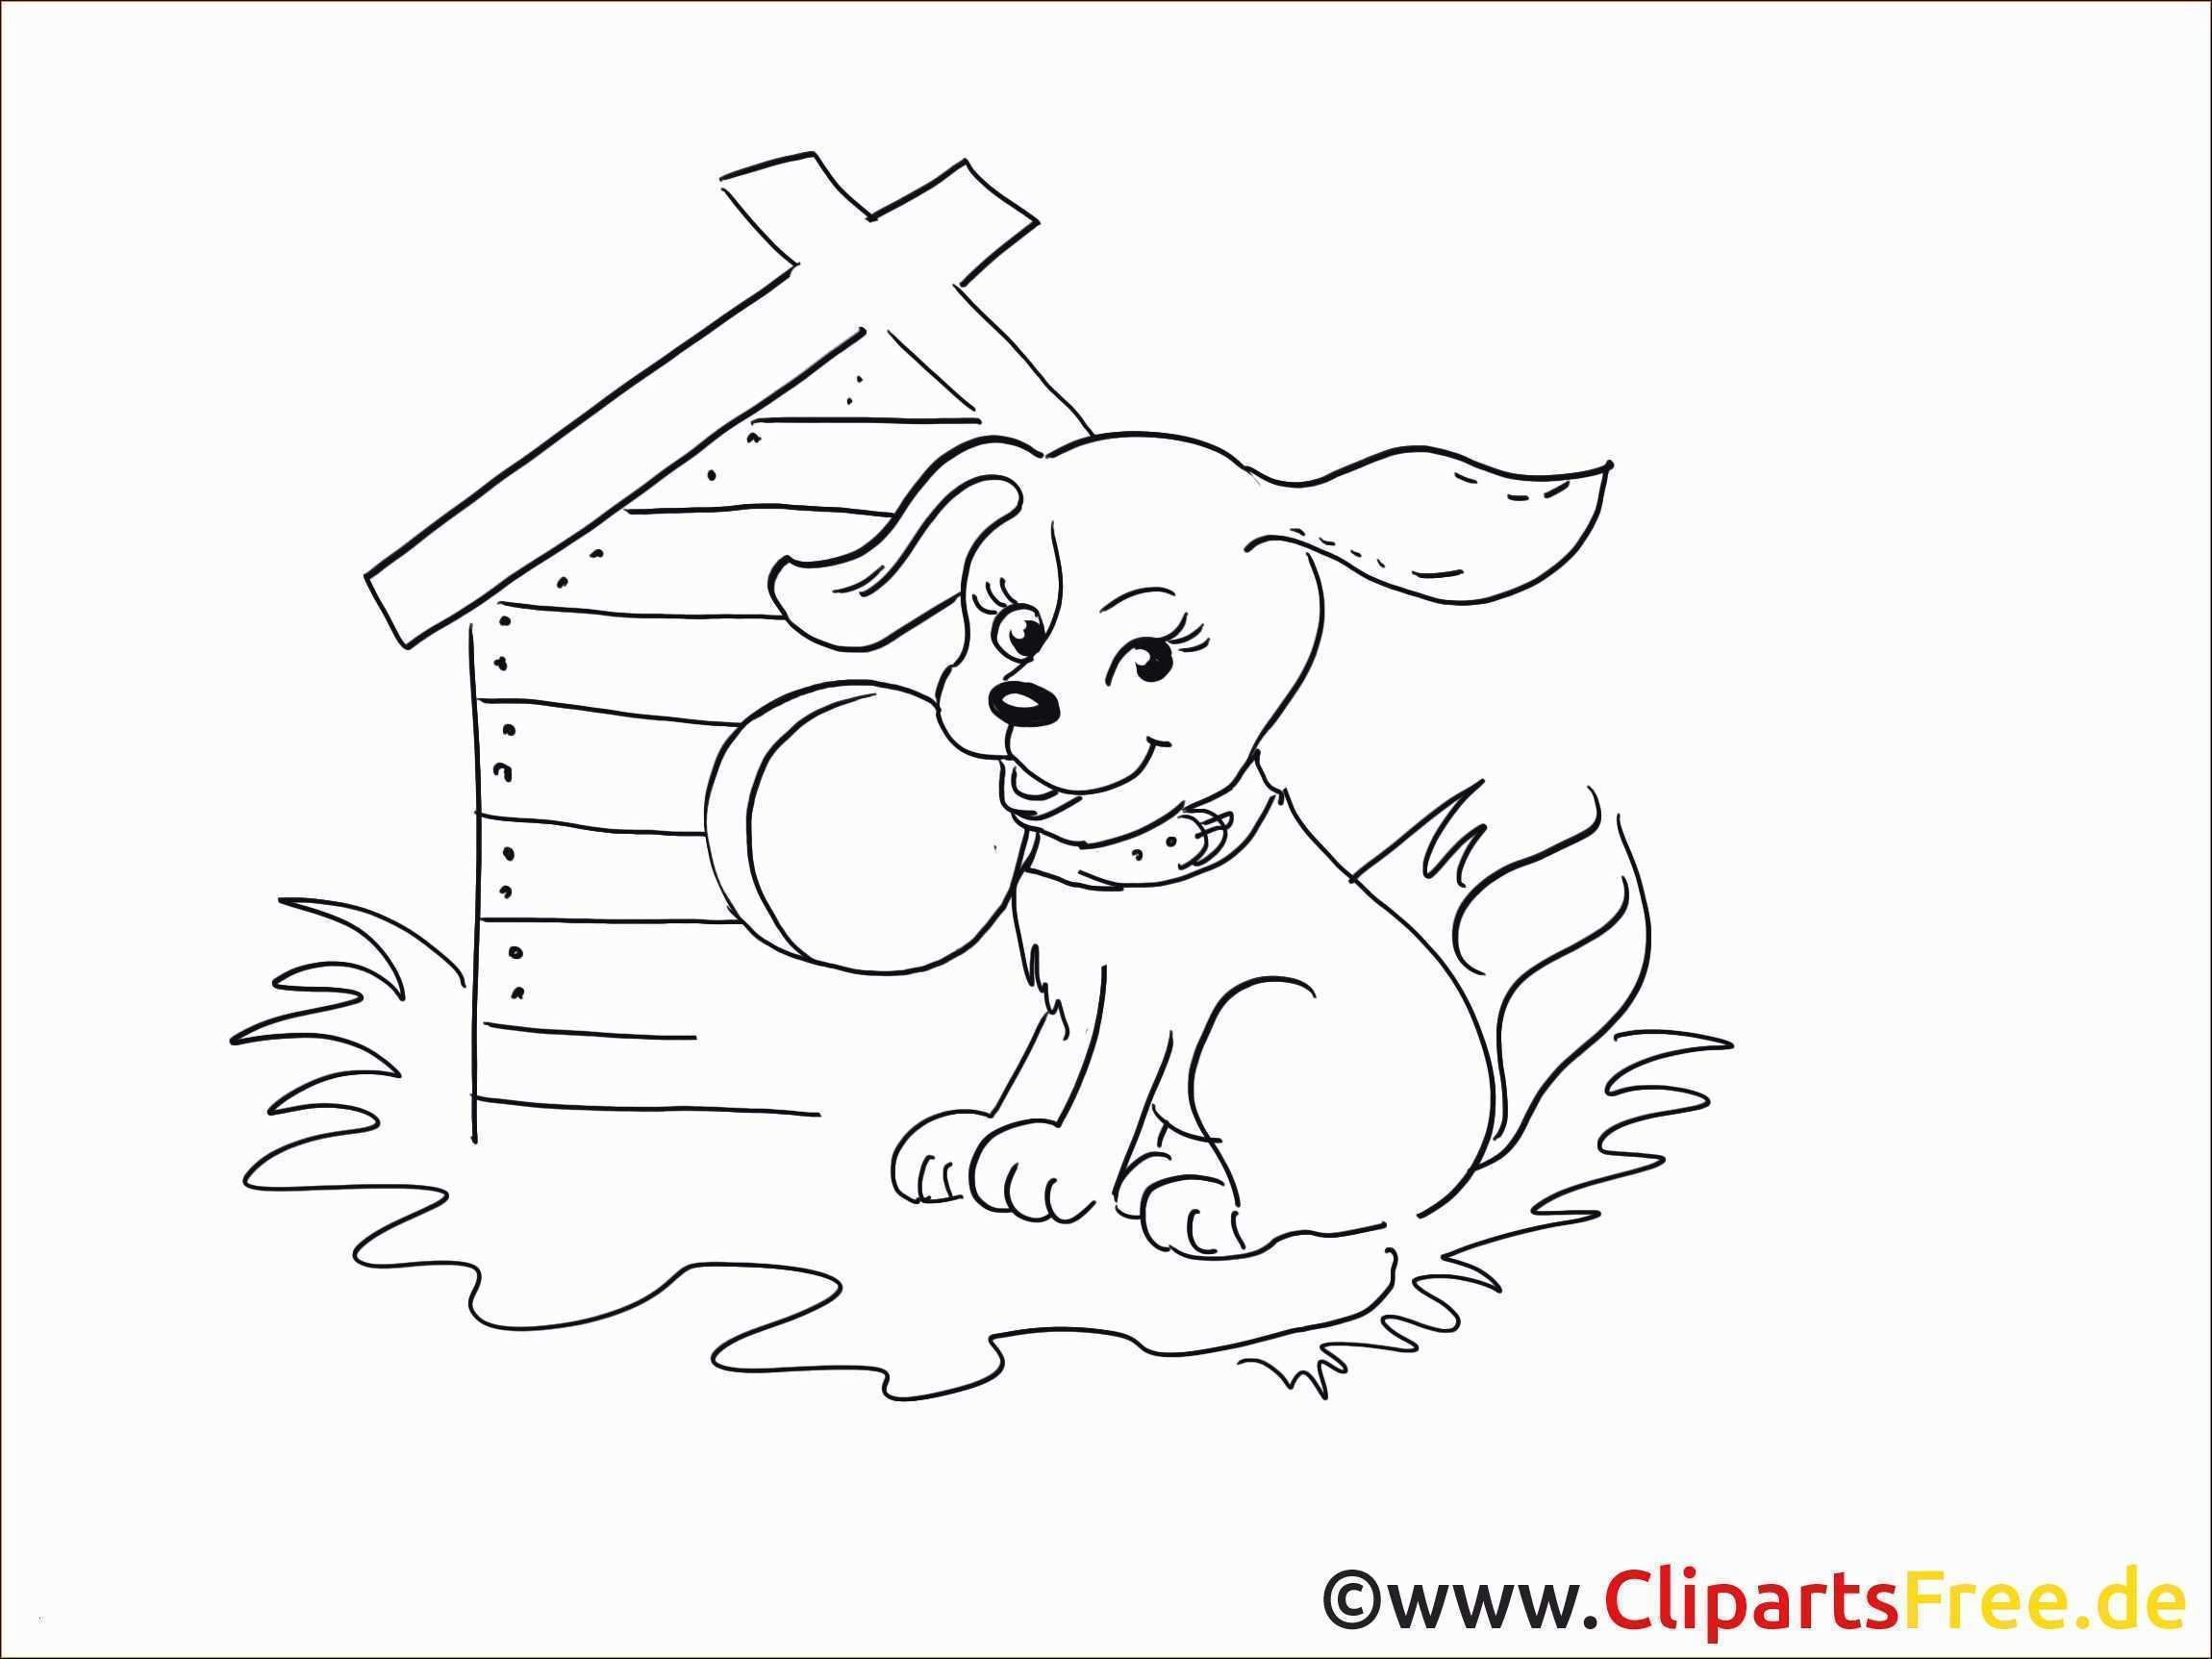 Jim Knopf Ausmalbild Genial Ausmal Bilder Hunde Ebenbild – Ausmalbilder Ideen Bild